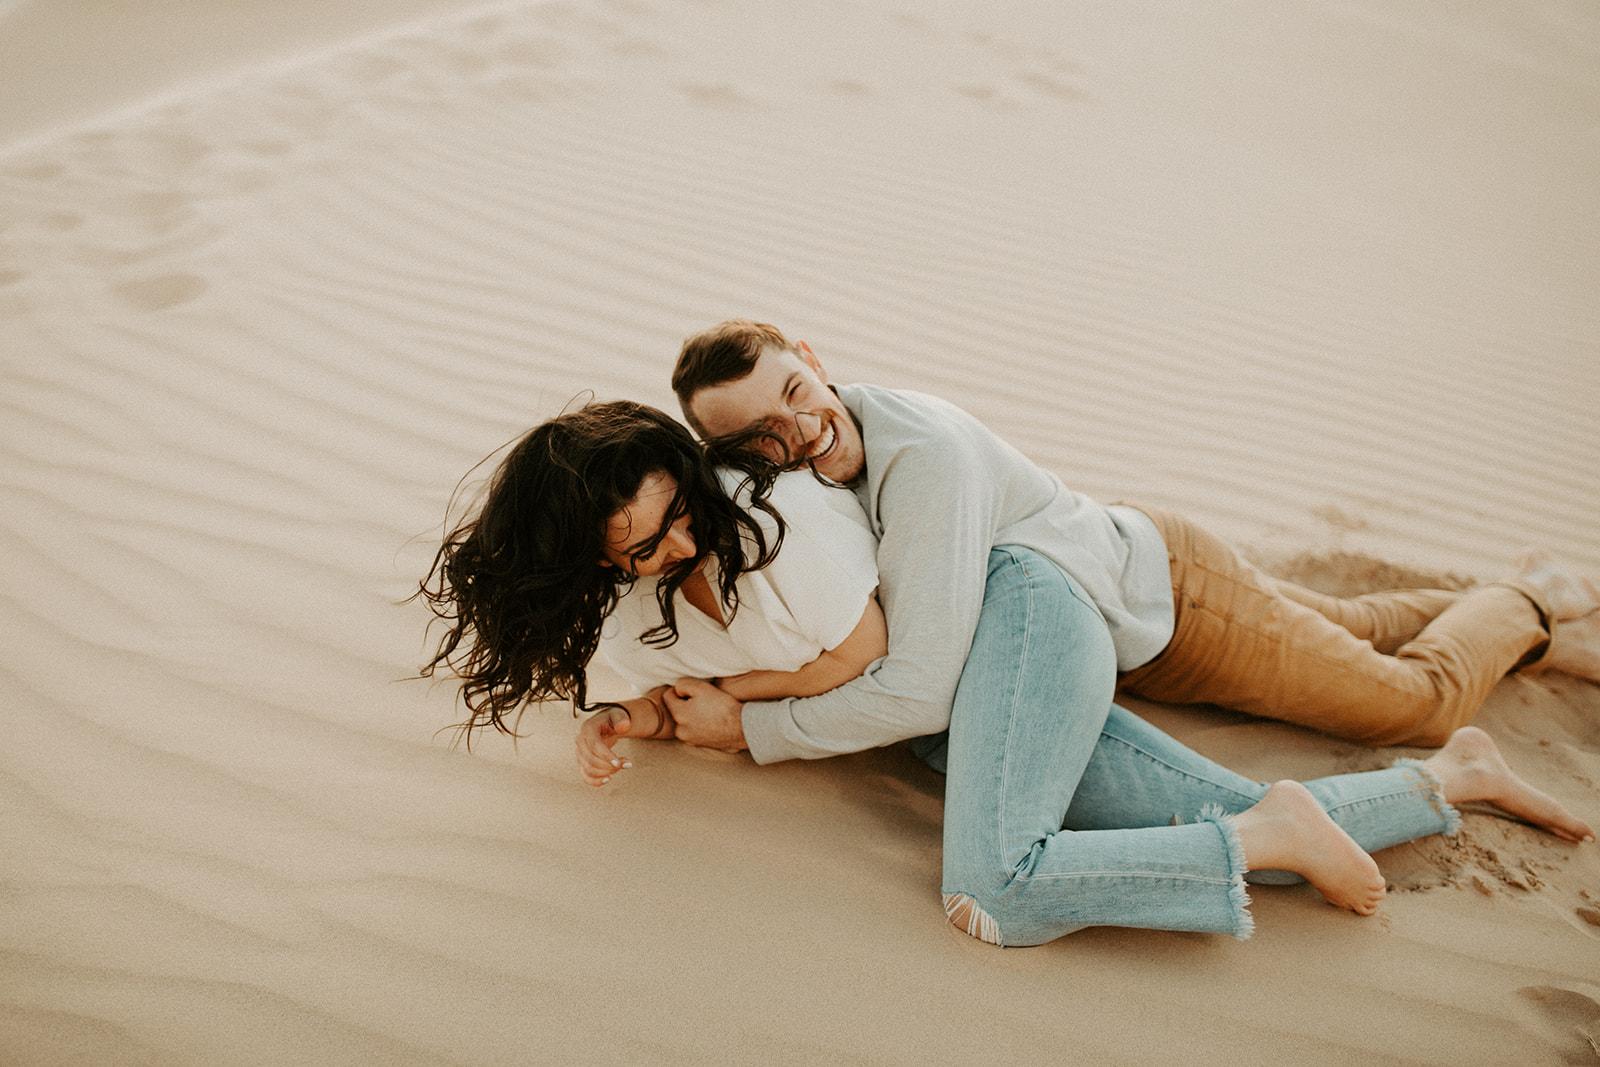 Imperial_Sand_Dunes_Linda_and_Sam_Dawn_Charles_Photographer-254.jpg